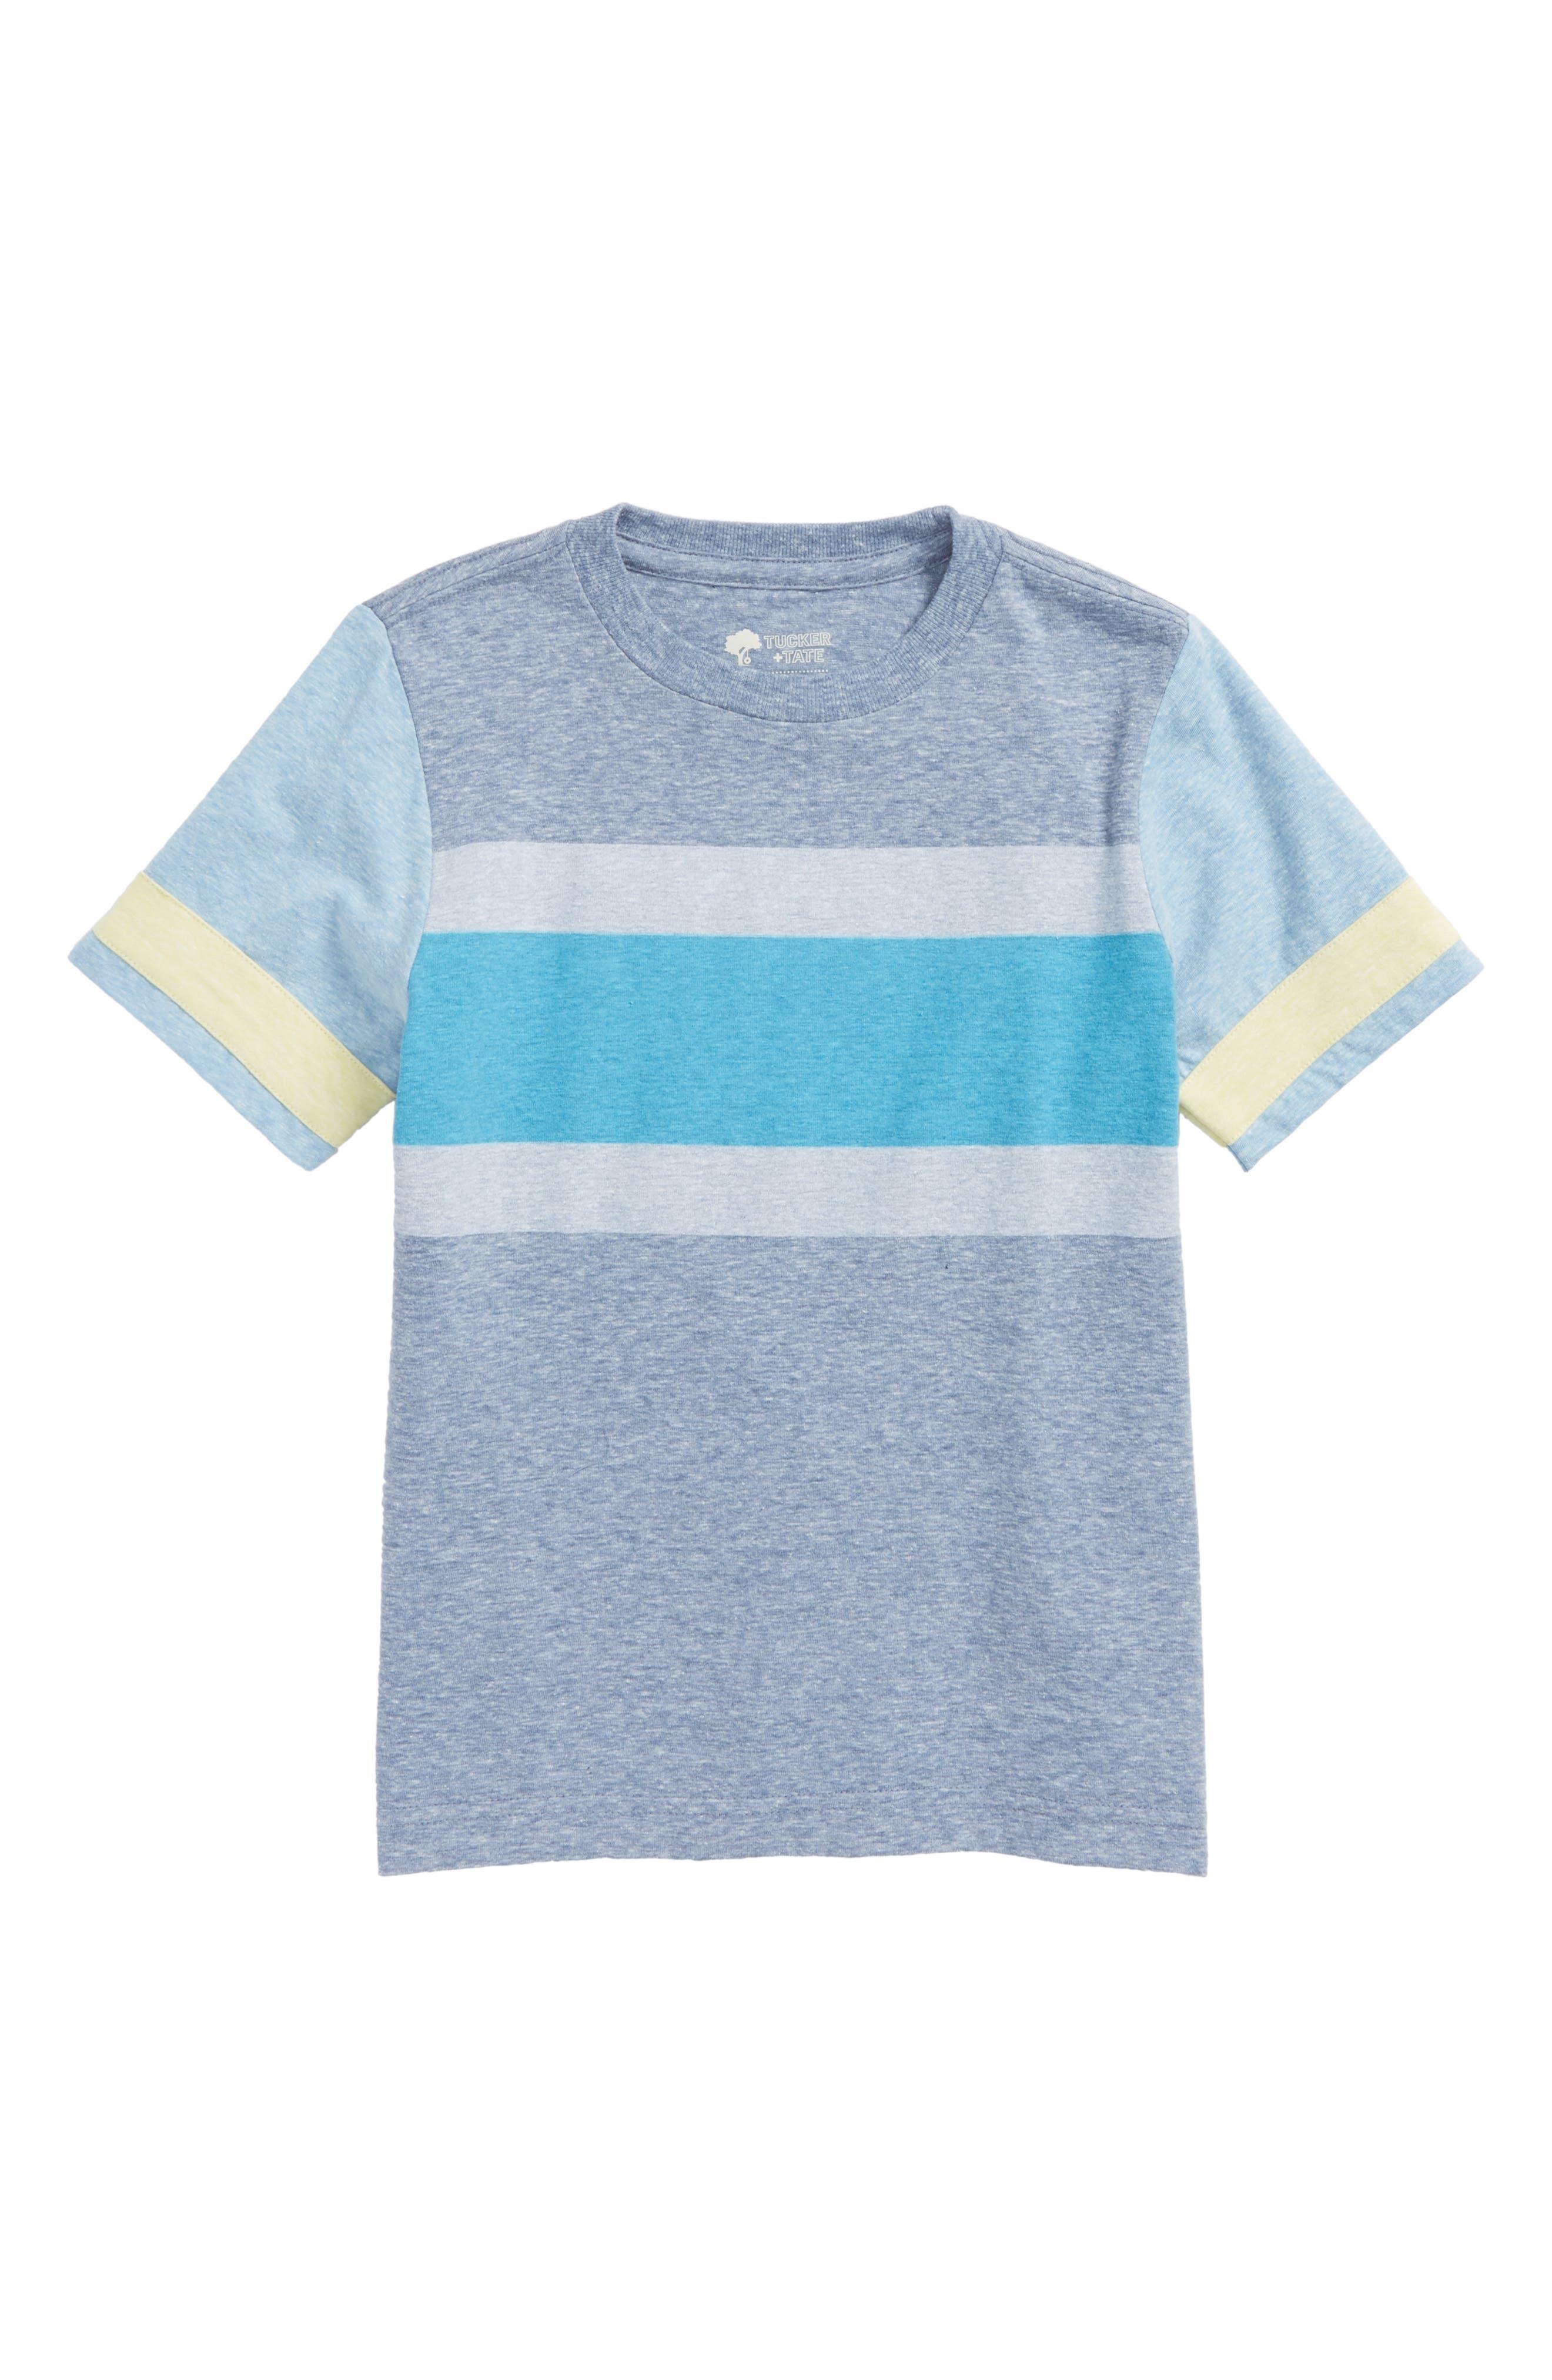 Stripe T-Shirt,                             Main thumbnail 1, color,                             Blue Calm- Blue